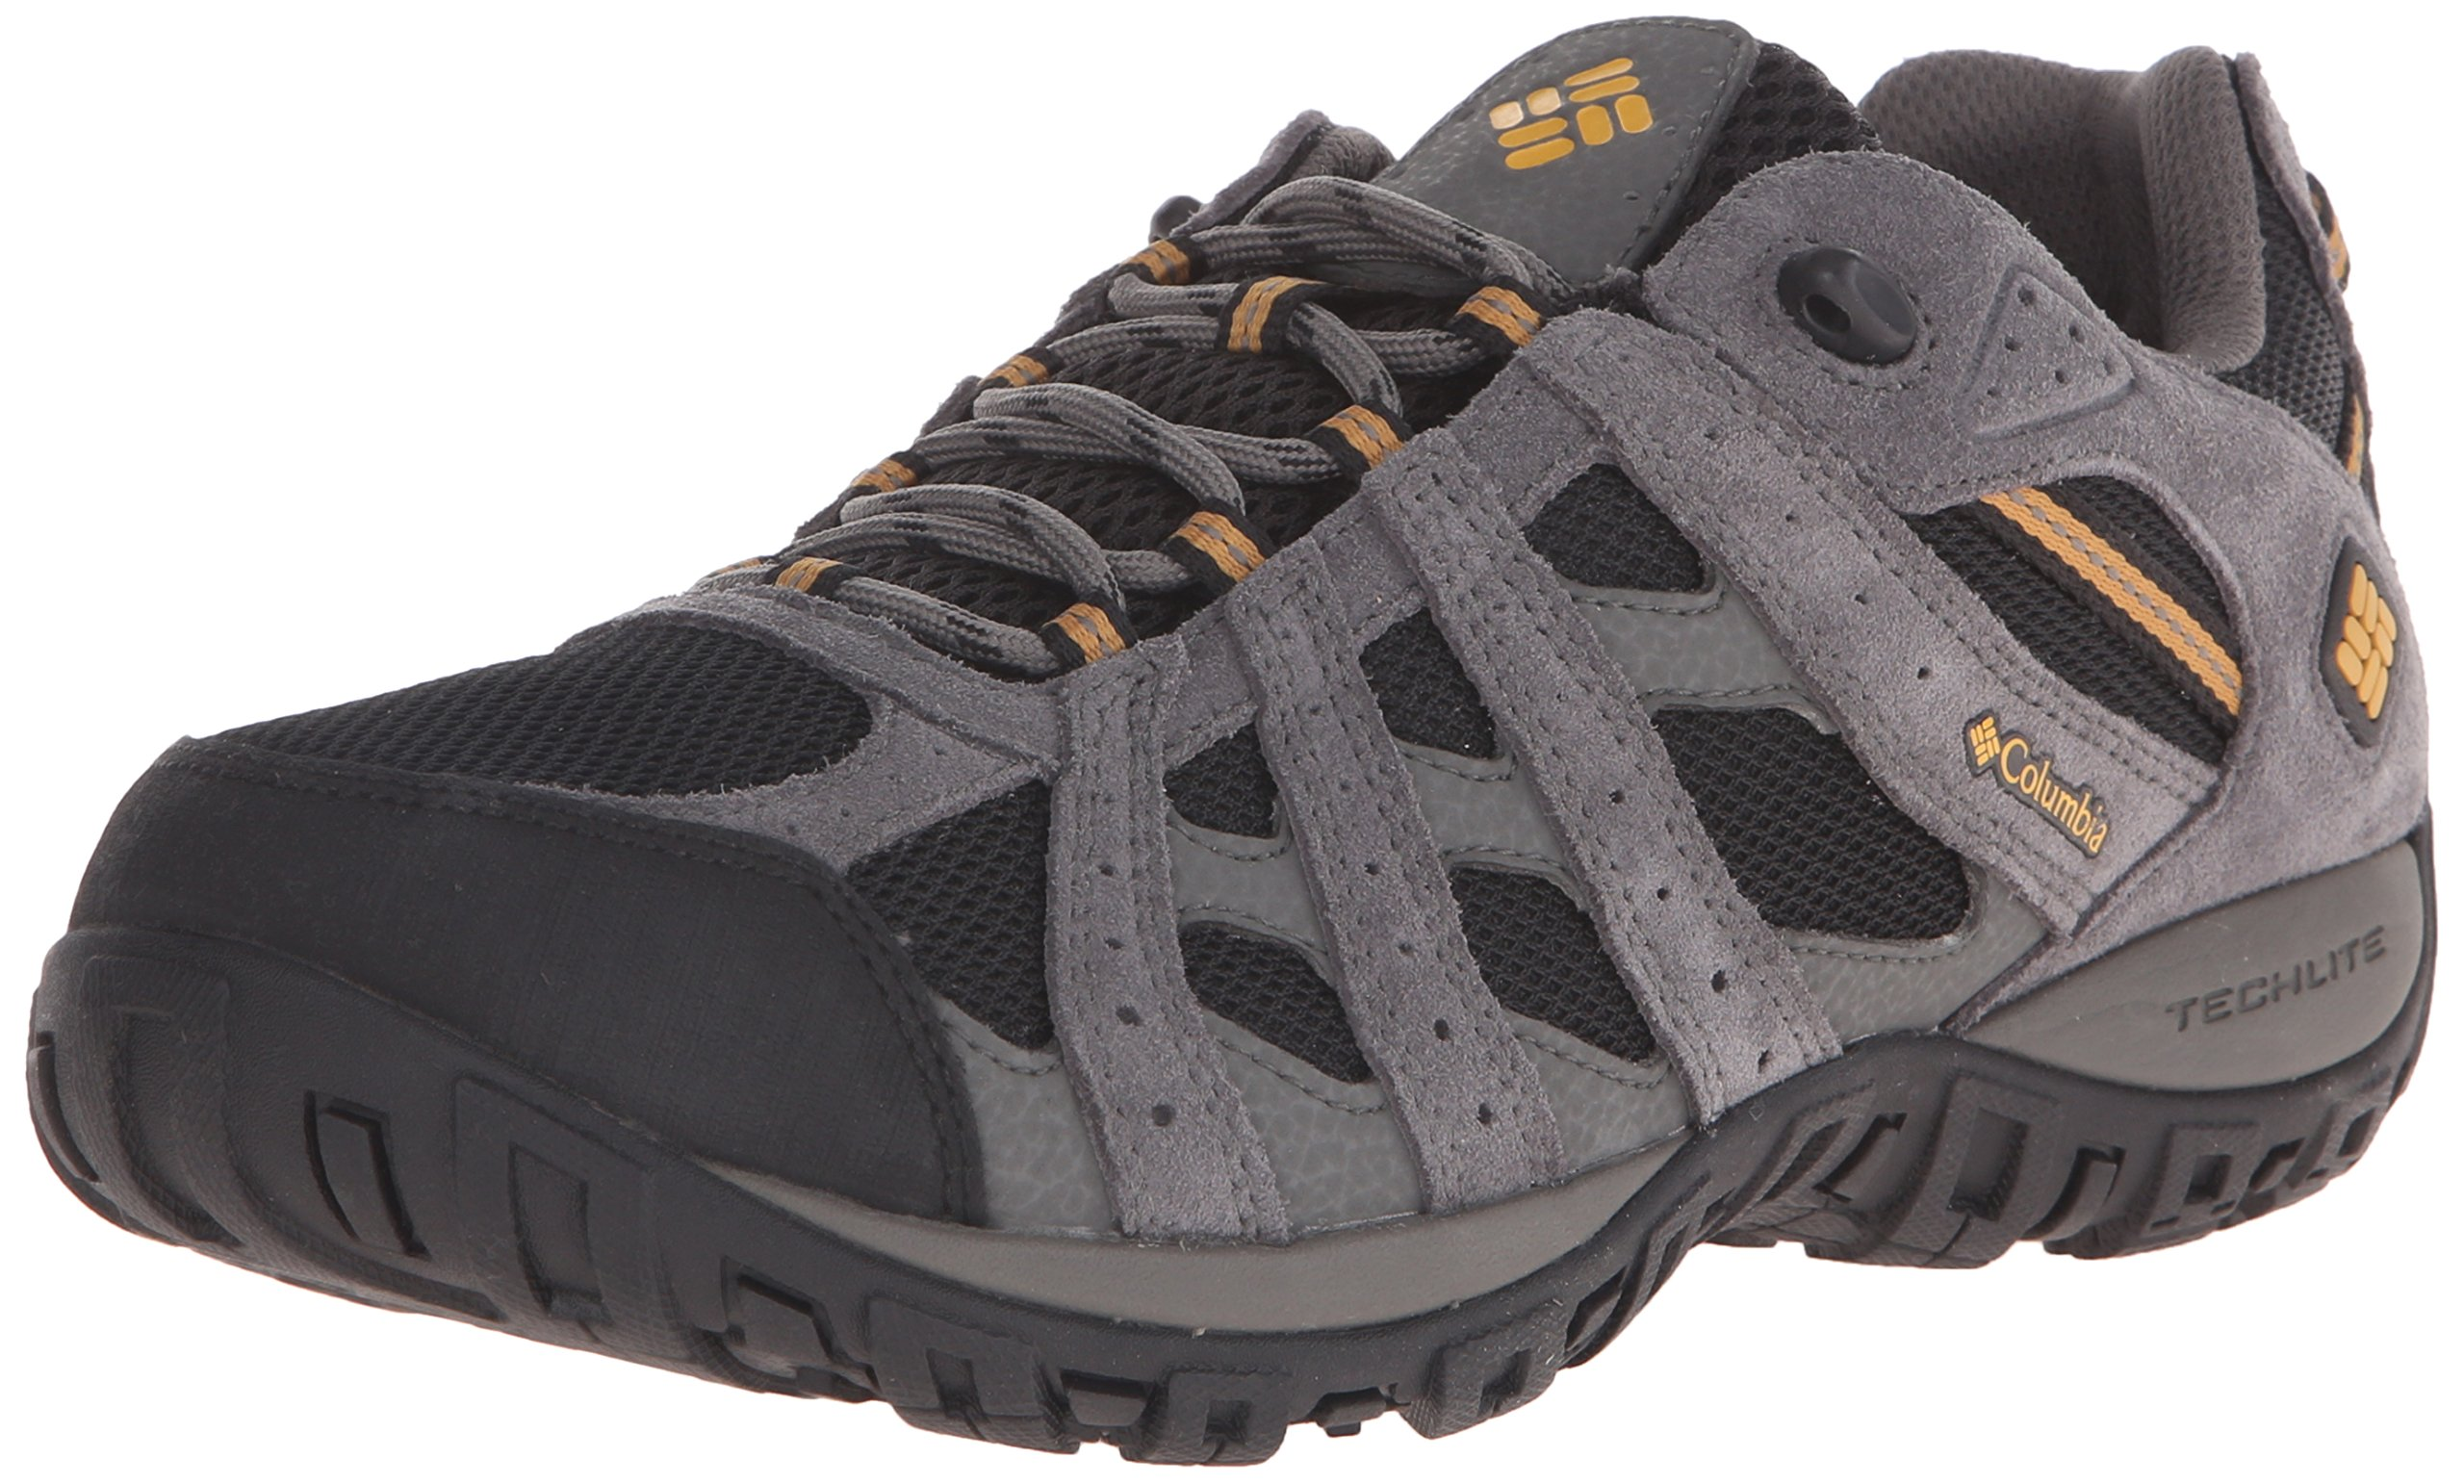 Columbia Men's Redmond Waterproof Hiking Shoe Black, Squash 7.5 D US by Columbia (Image #1)